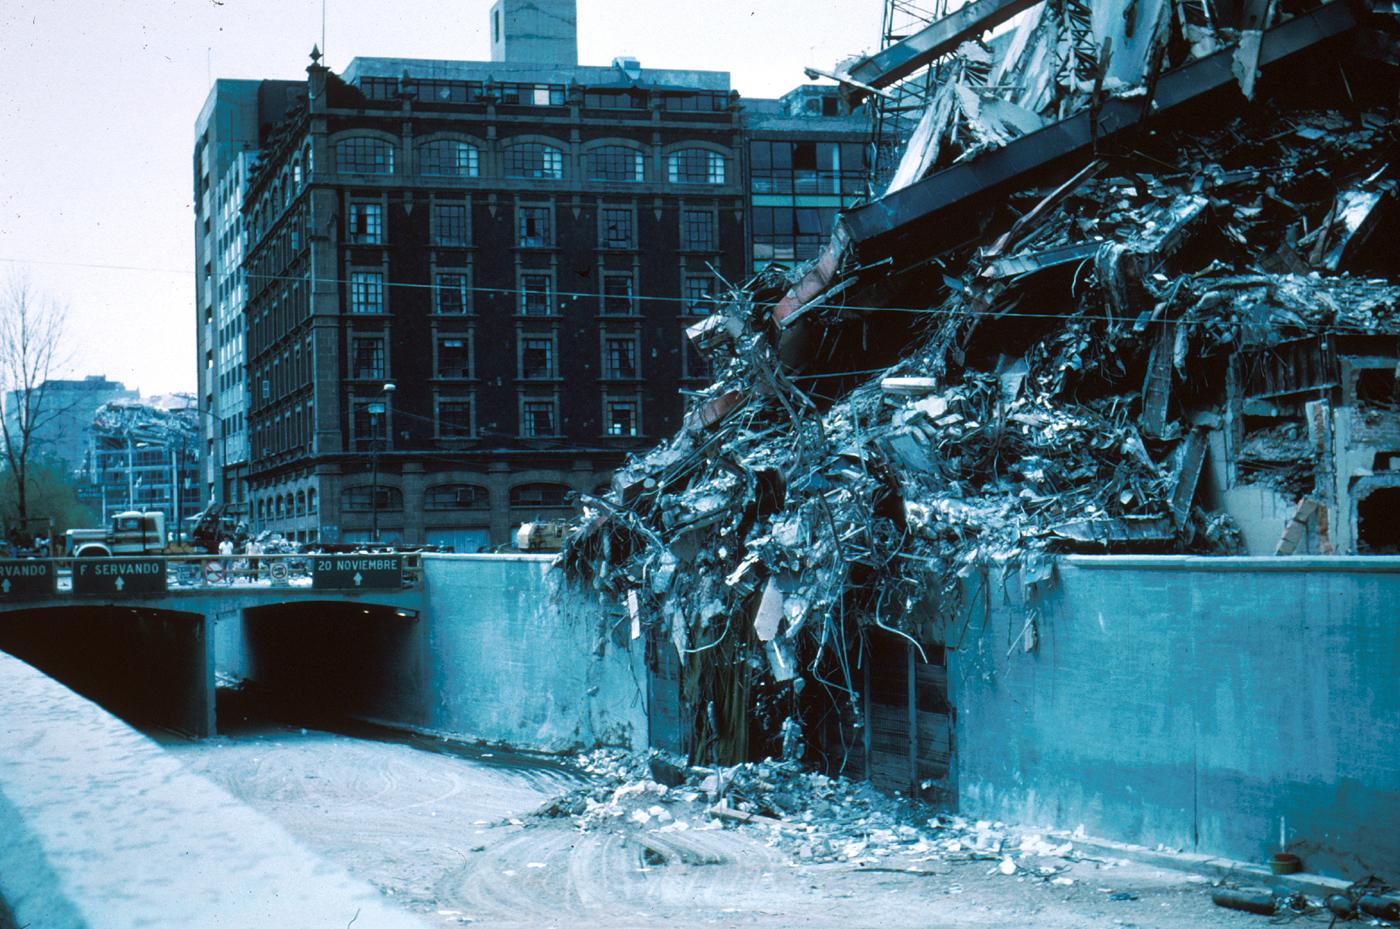 File:1985 Mexico Earthquake - Pina Suarez Apartment ...